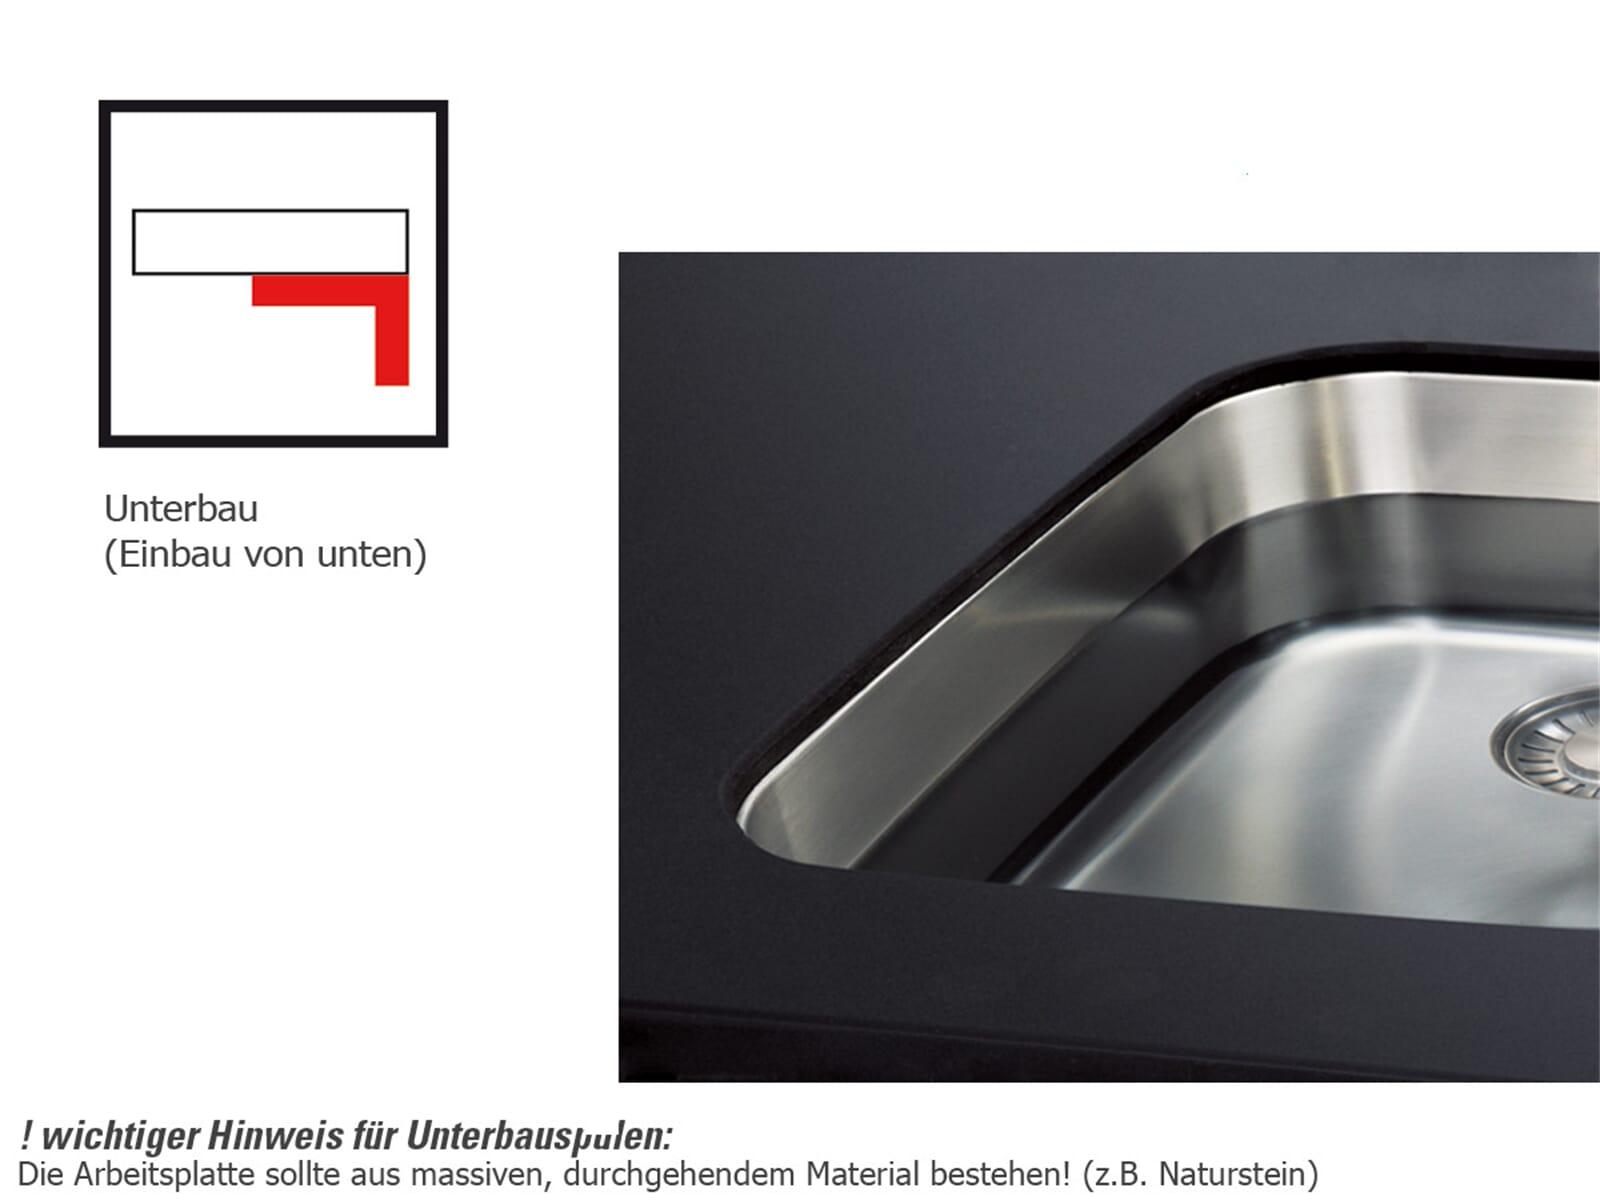 Franke Kubus KBK 160 Onyx - 126.0335.887 Keramikspüle